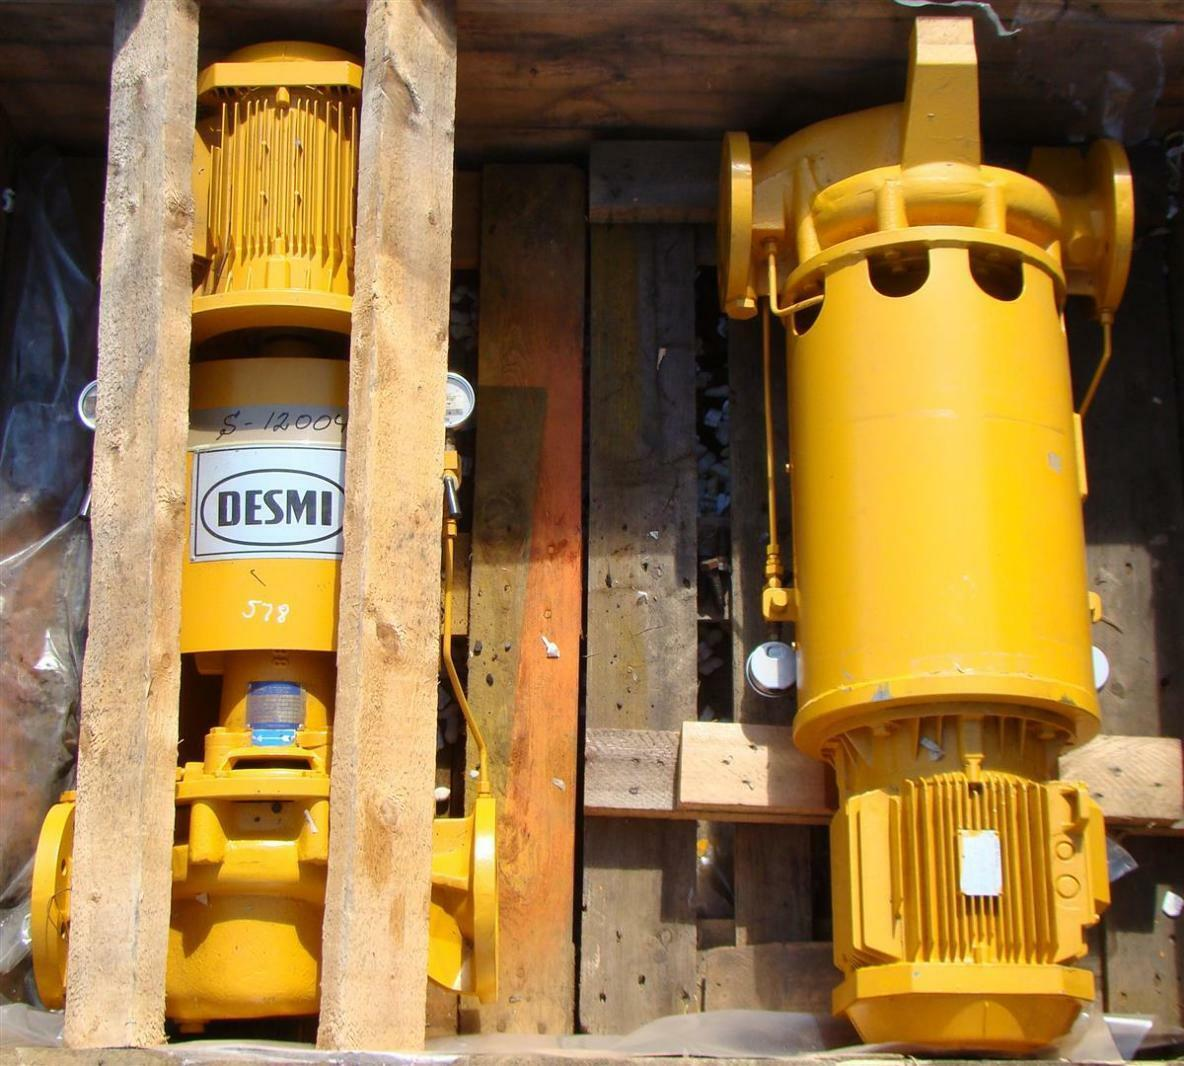 Desmi 3 Phase 6.4 KW Vertical Centrifugal Pump Type SL80-215/A-B | eBay